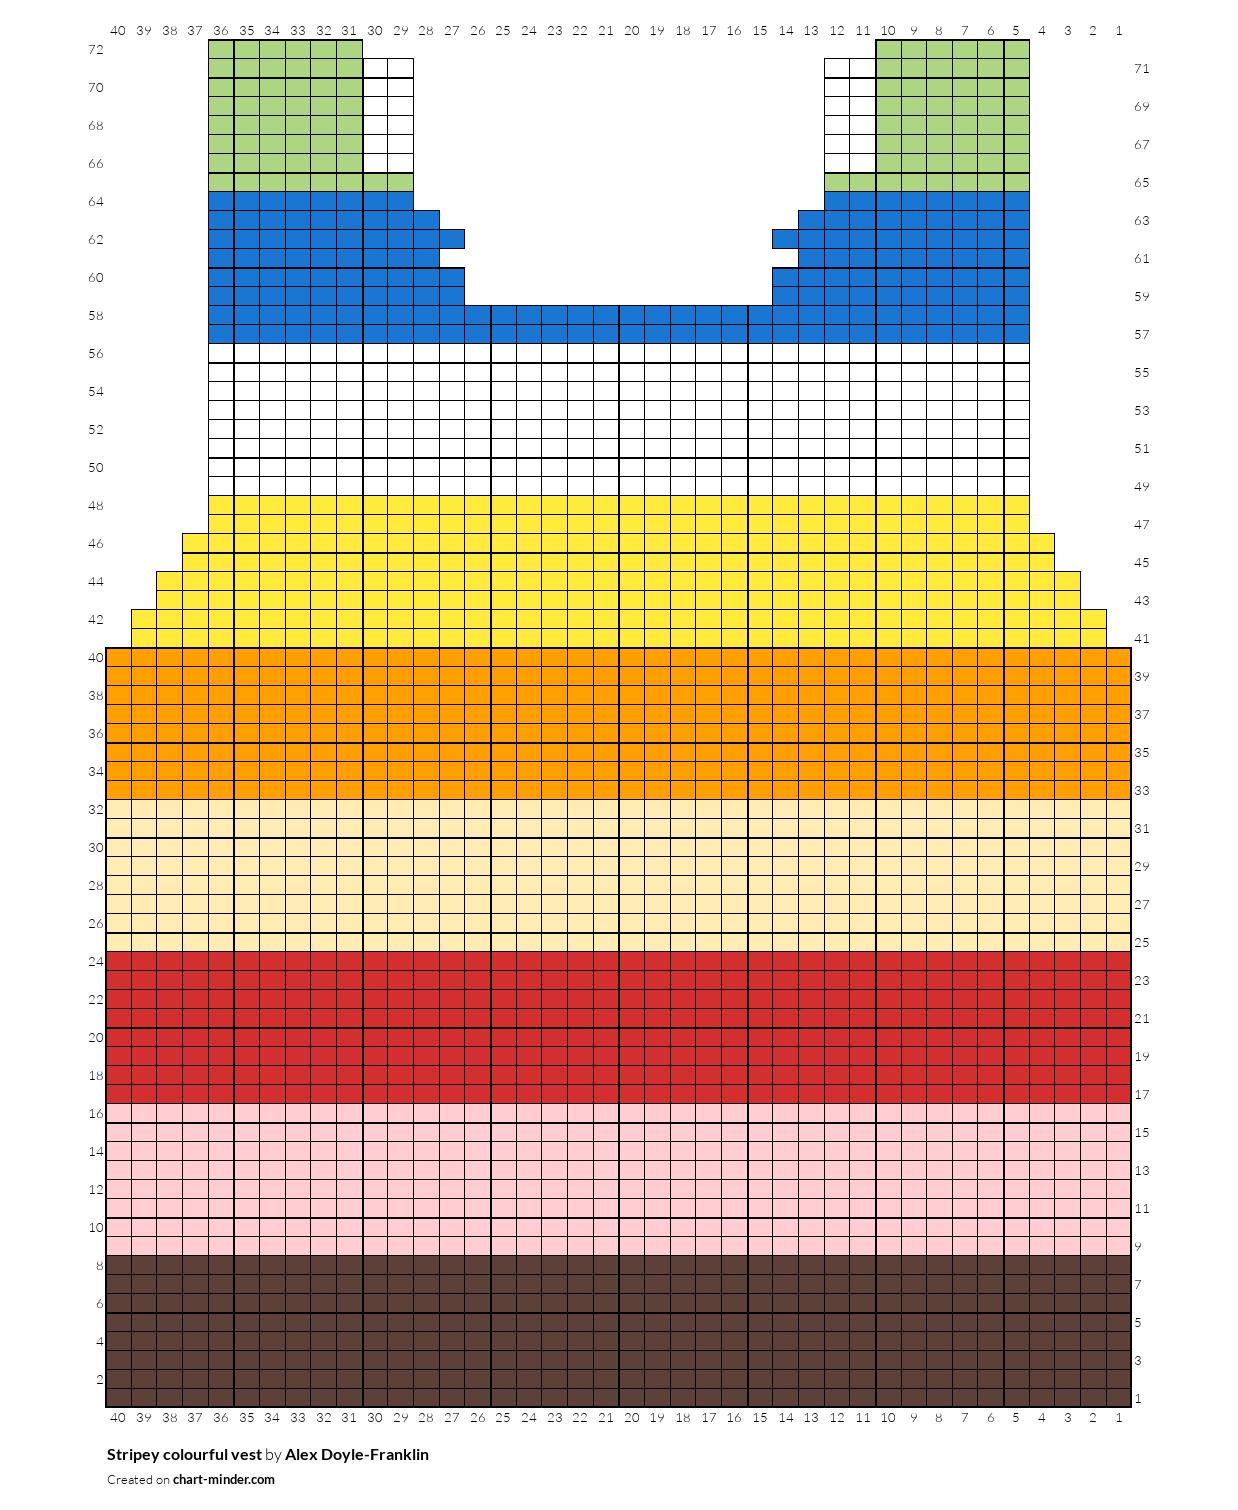 Stripey colourful vest